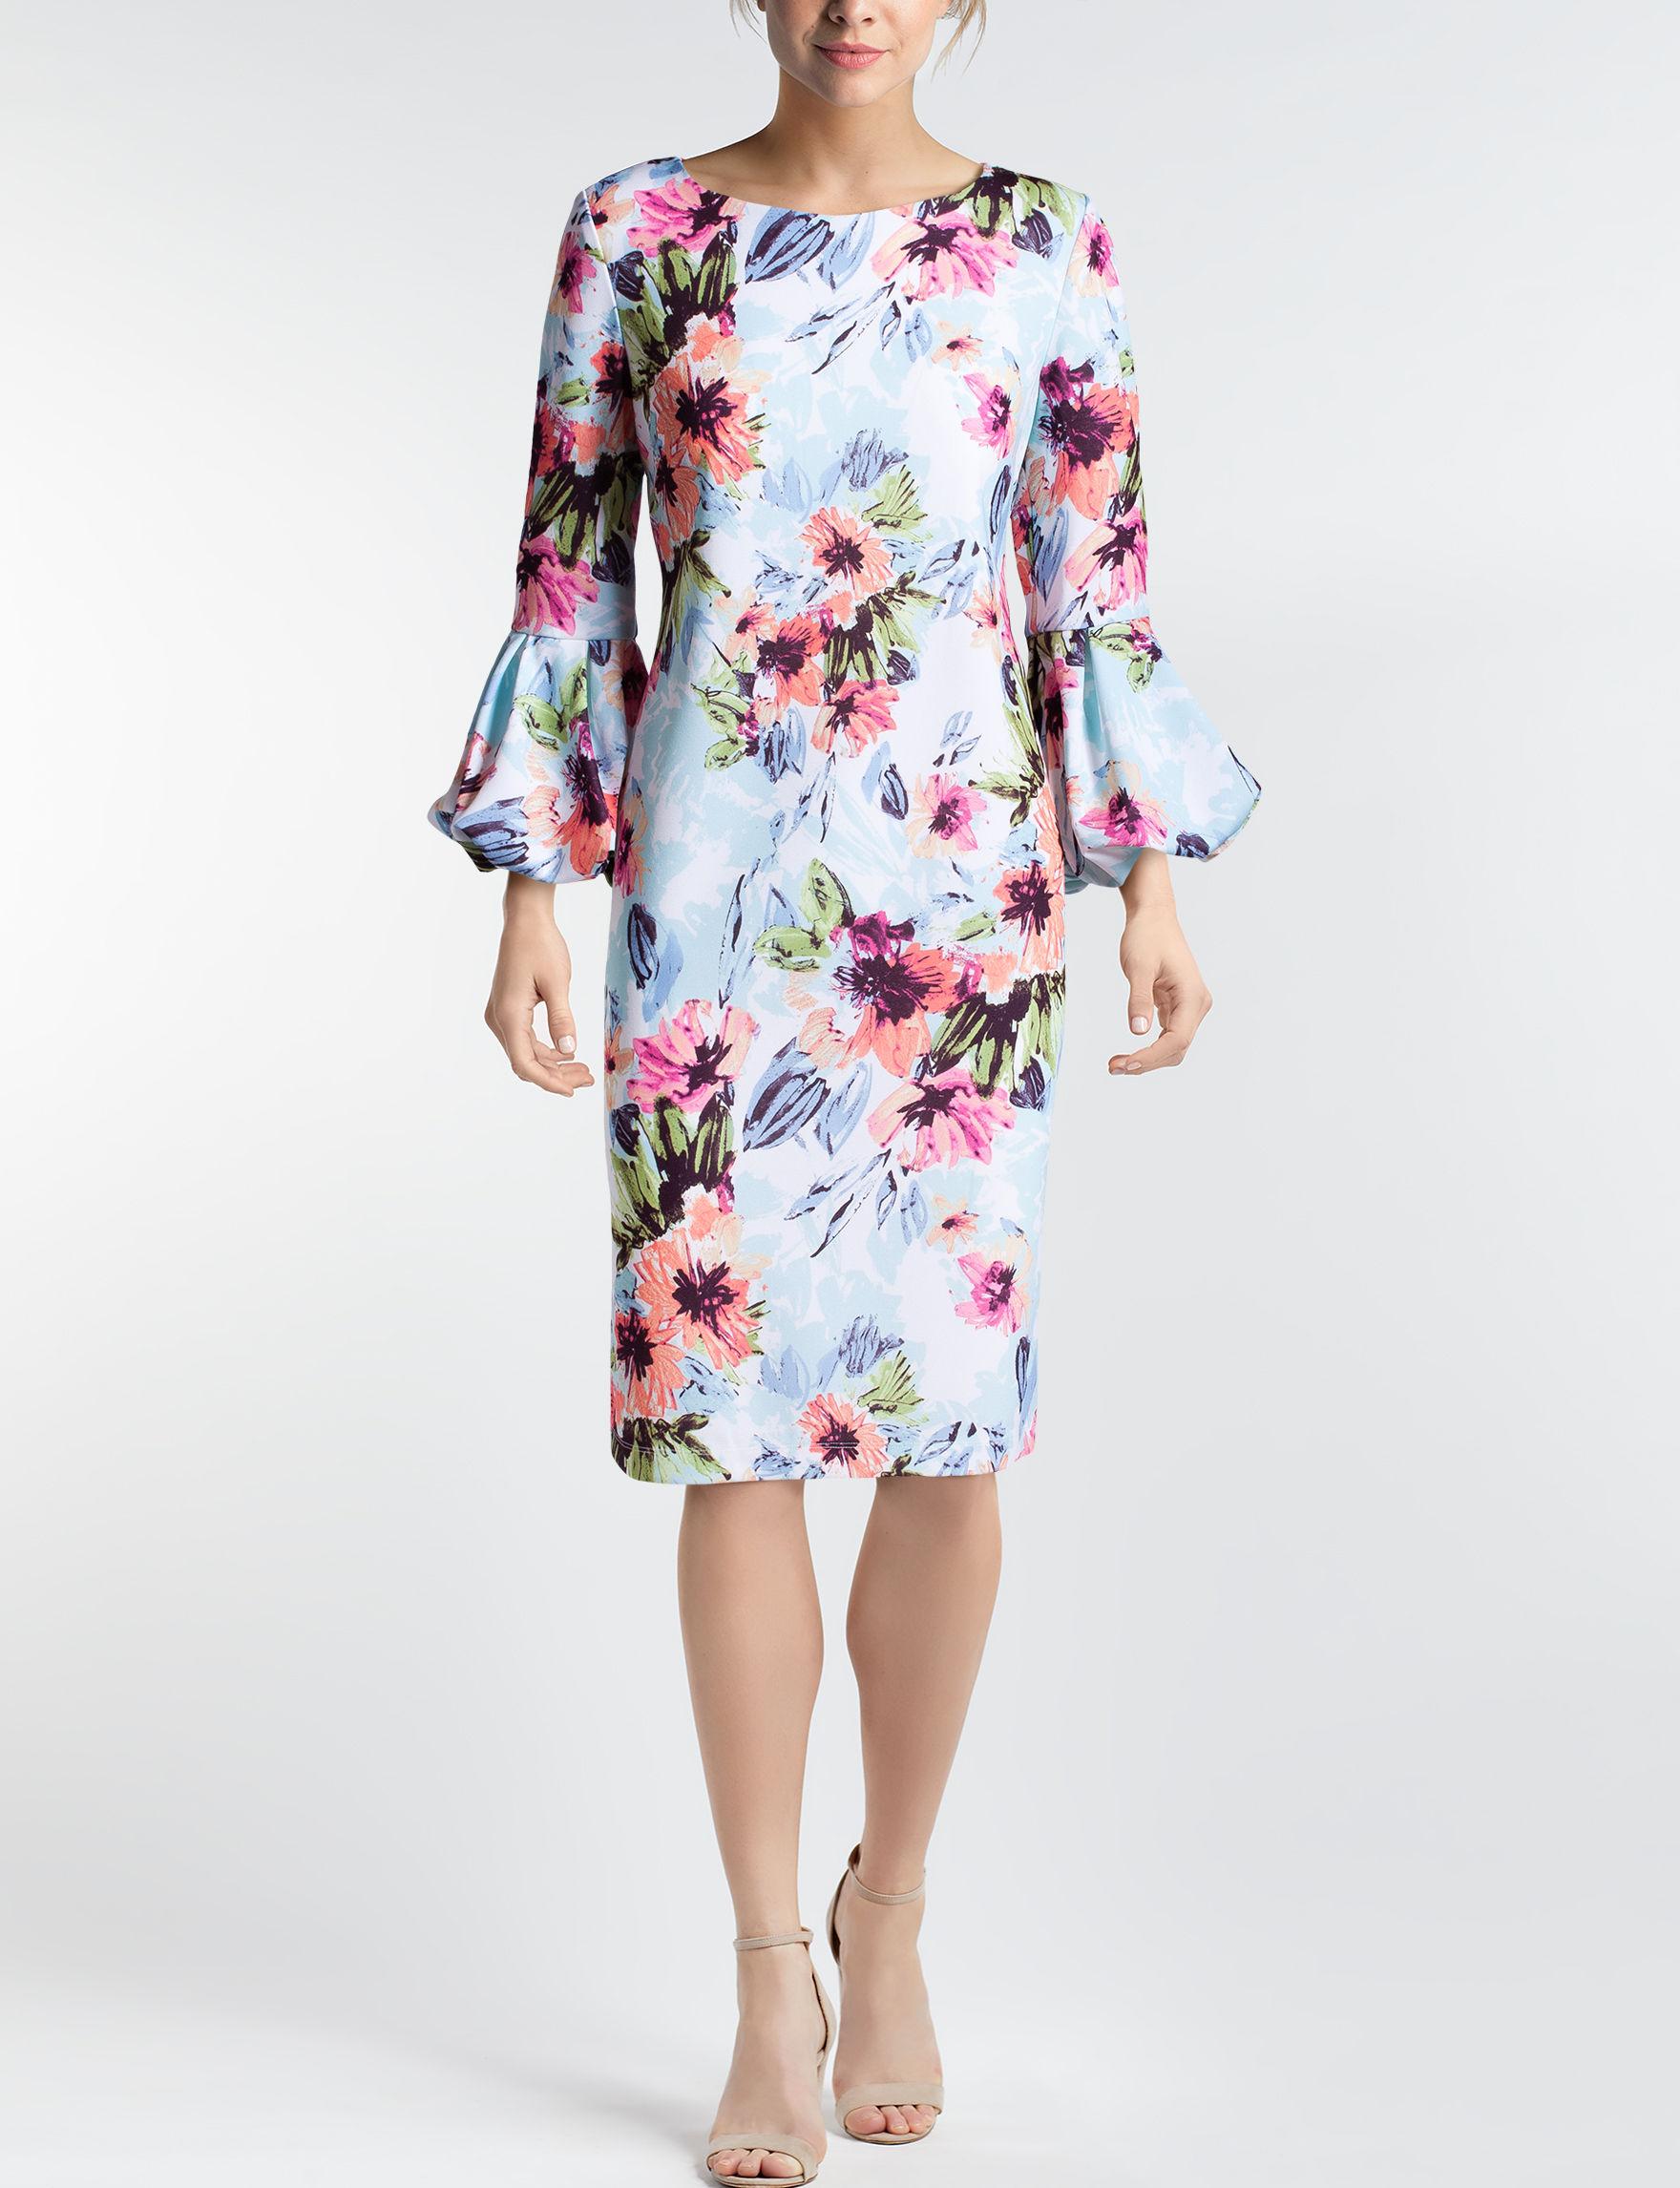 Ronni Nicole Blue Floral Everyday & Casual Sheath Dresses